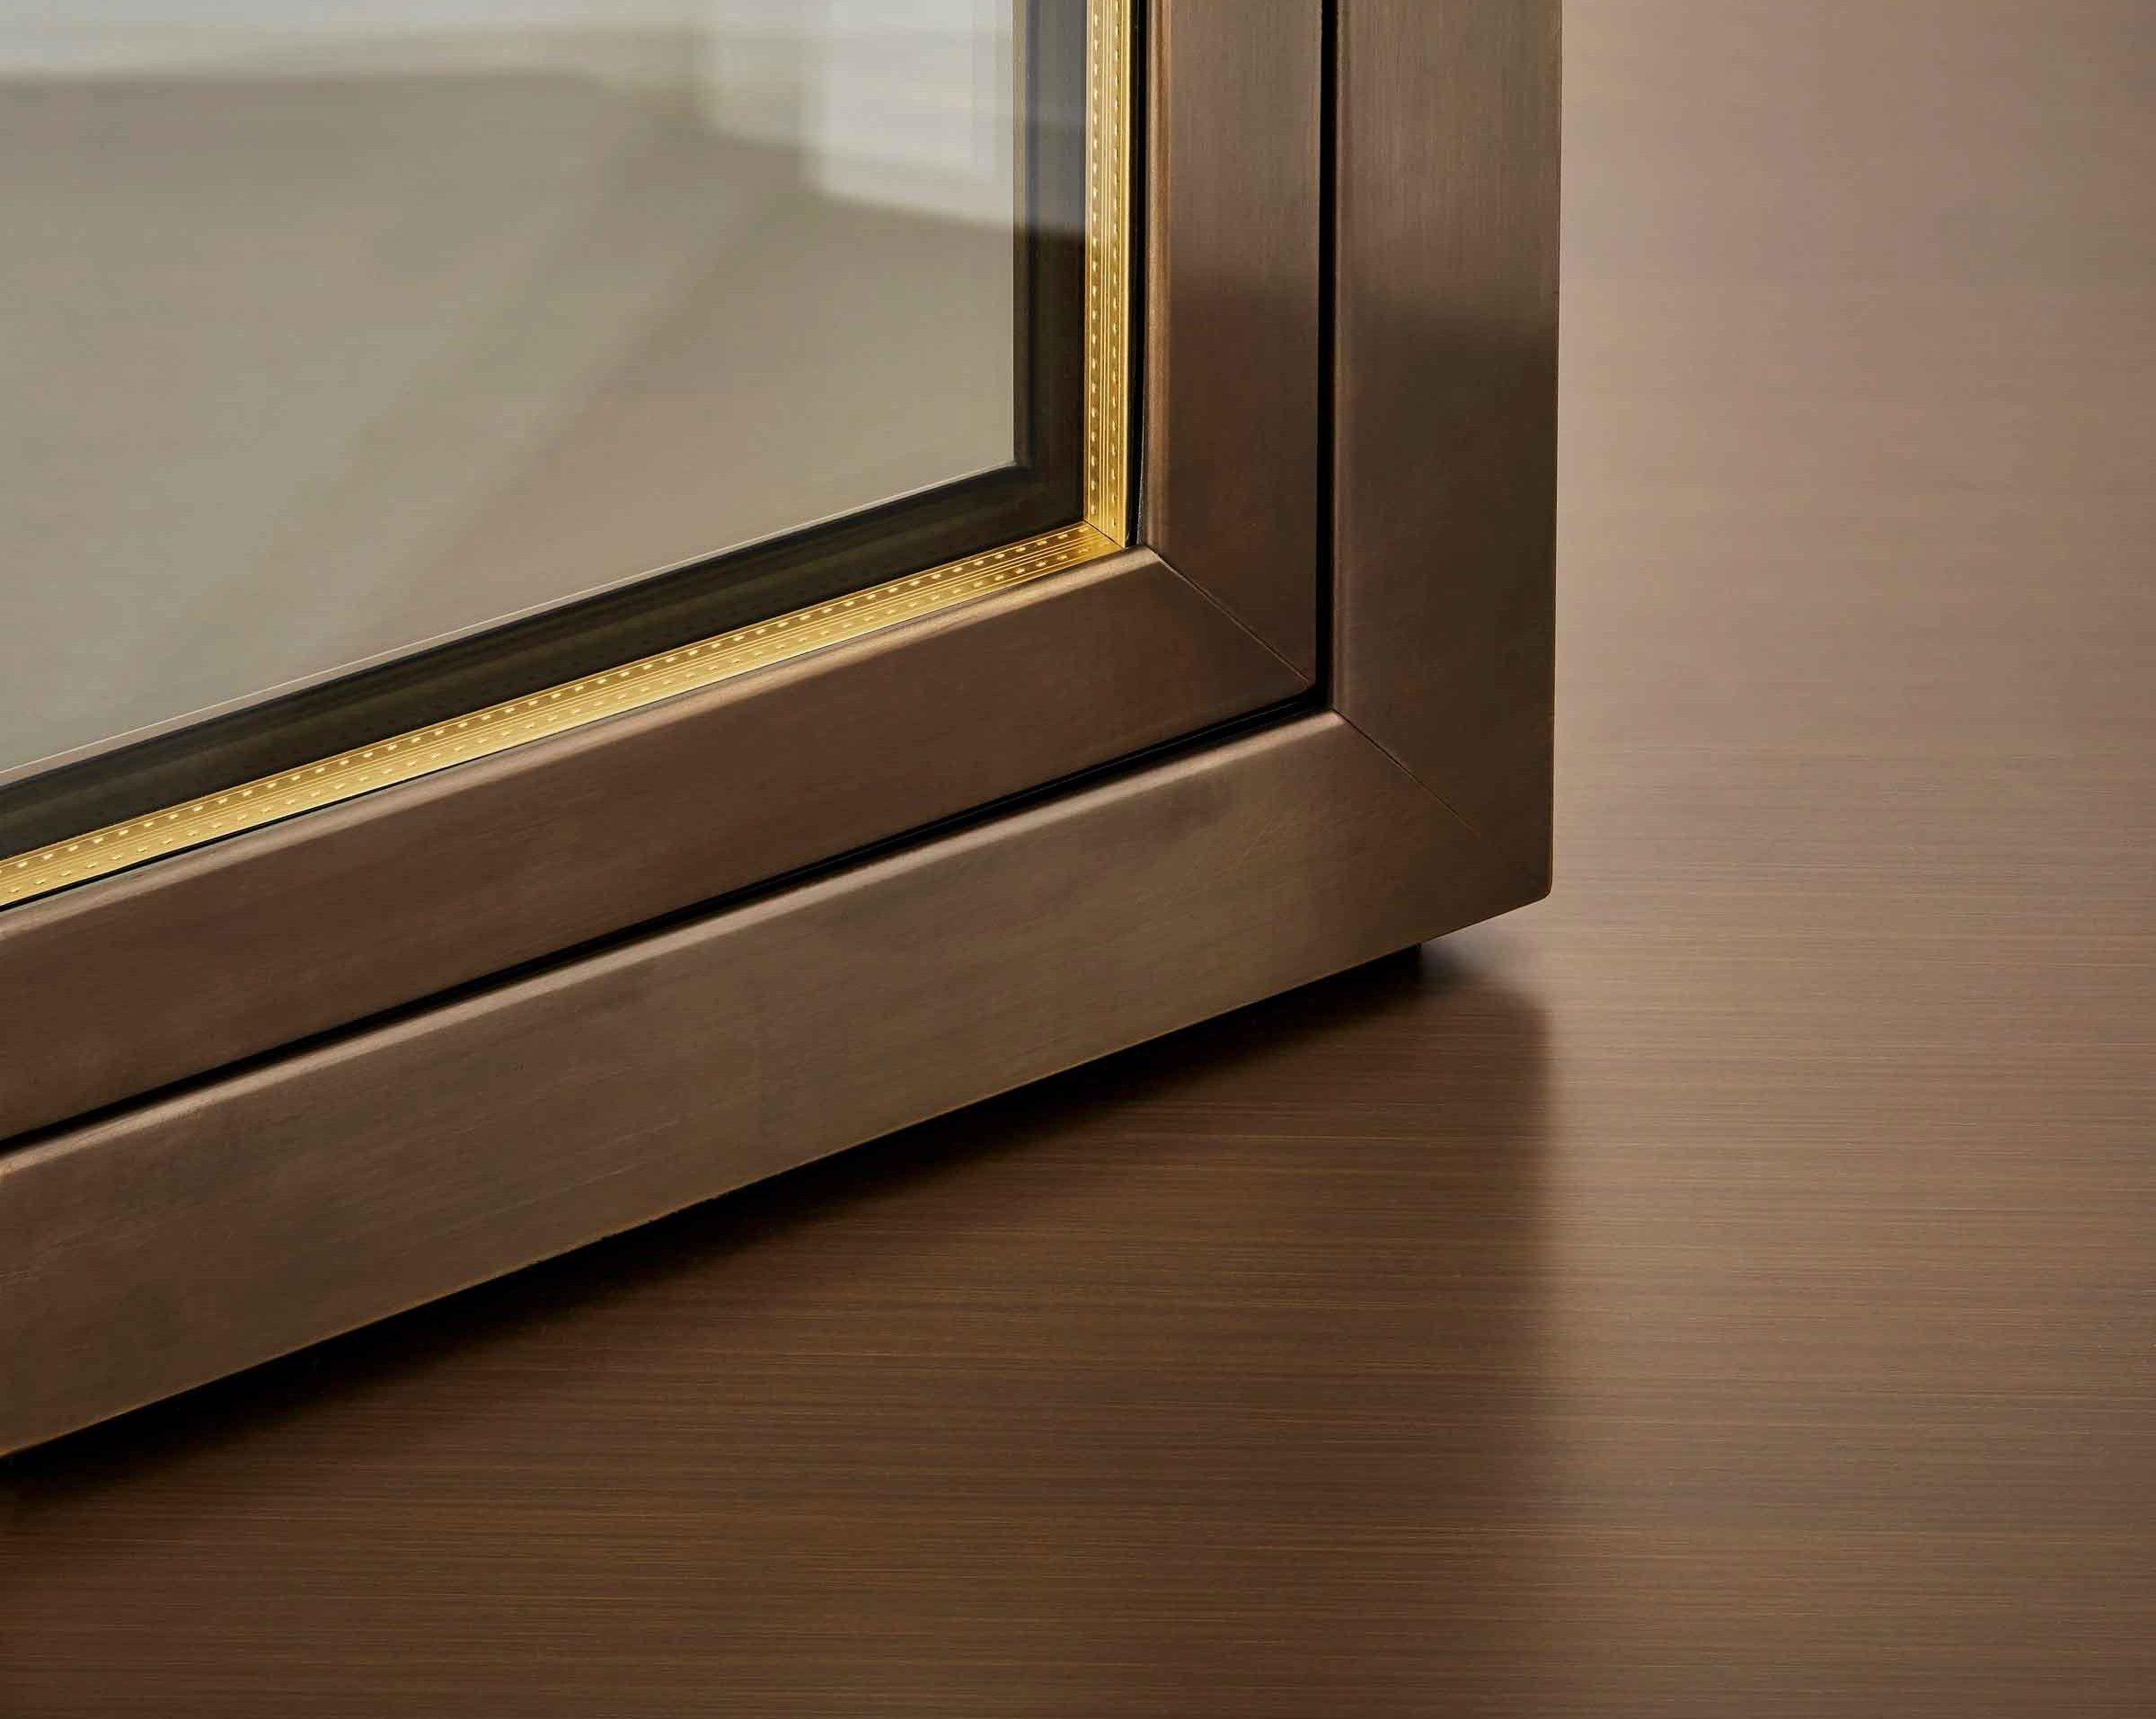 درب-و-پنجره-یو-پی-وی-سی-رنگی-آماج-صنعت-رنگی-102